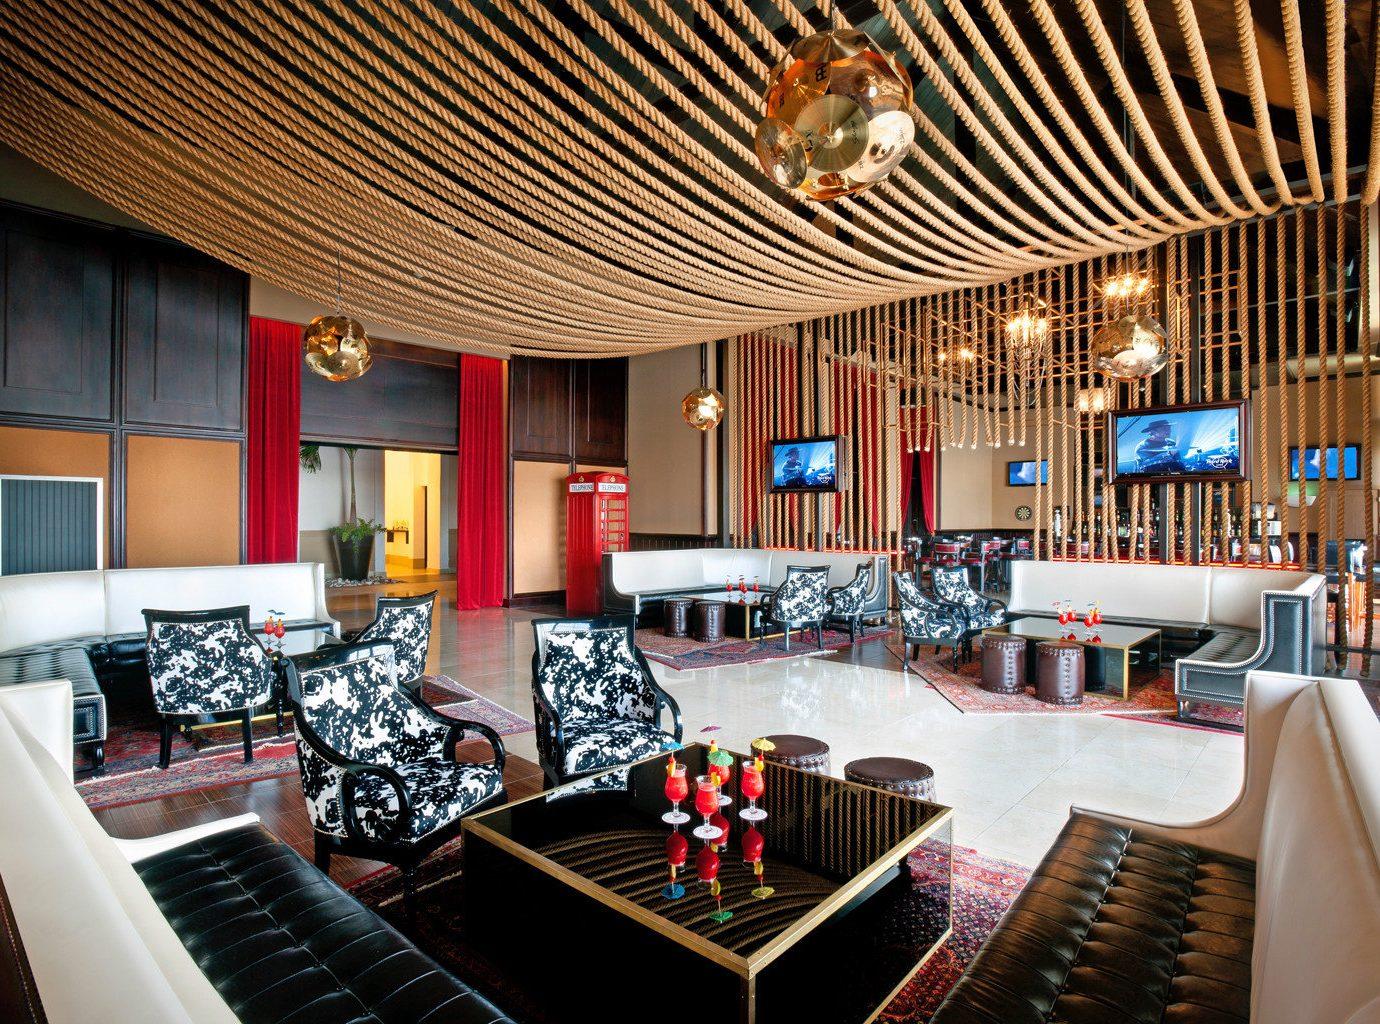 Lobby at Hard Rock Hotel & Casino Punta Cana, Dominican Republic